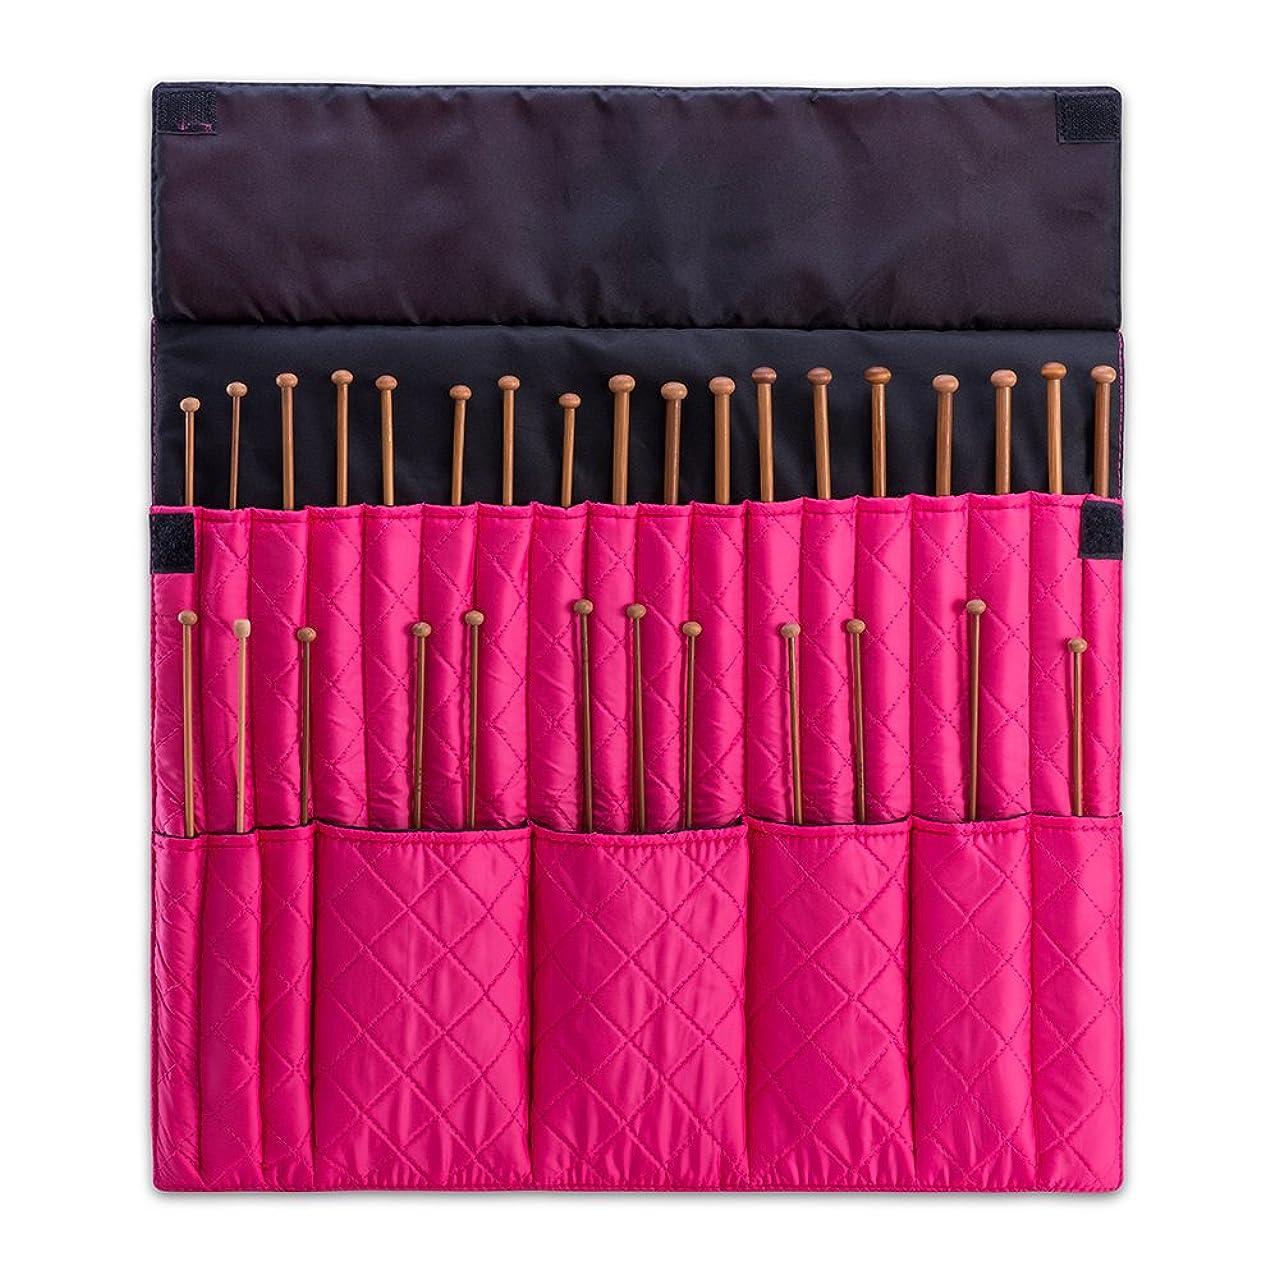 DeNOA Knitting Needle Storage Case - Crochet Hook Folding Organizer Travel Wrap - Bubblegum